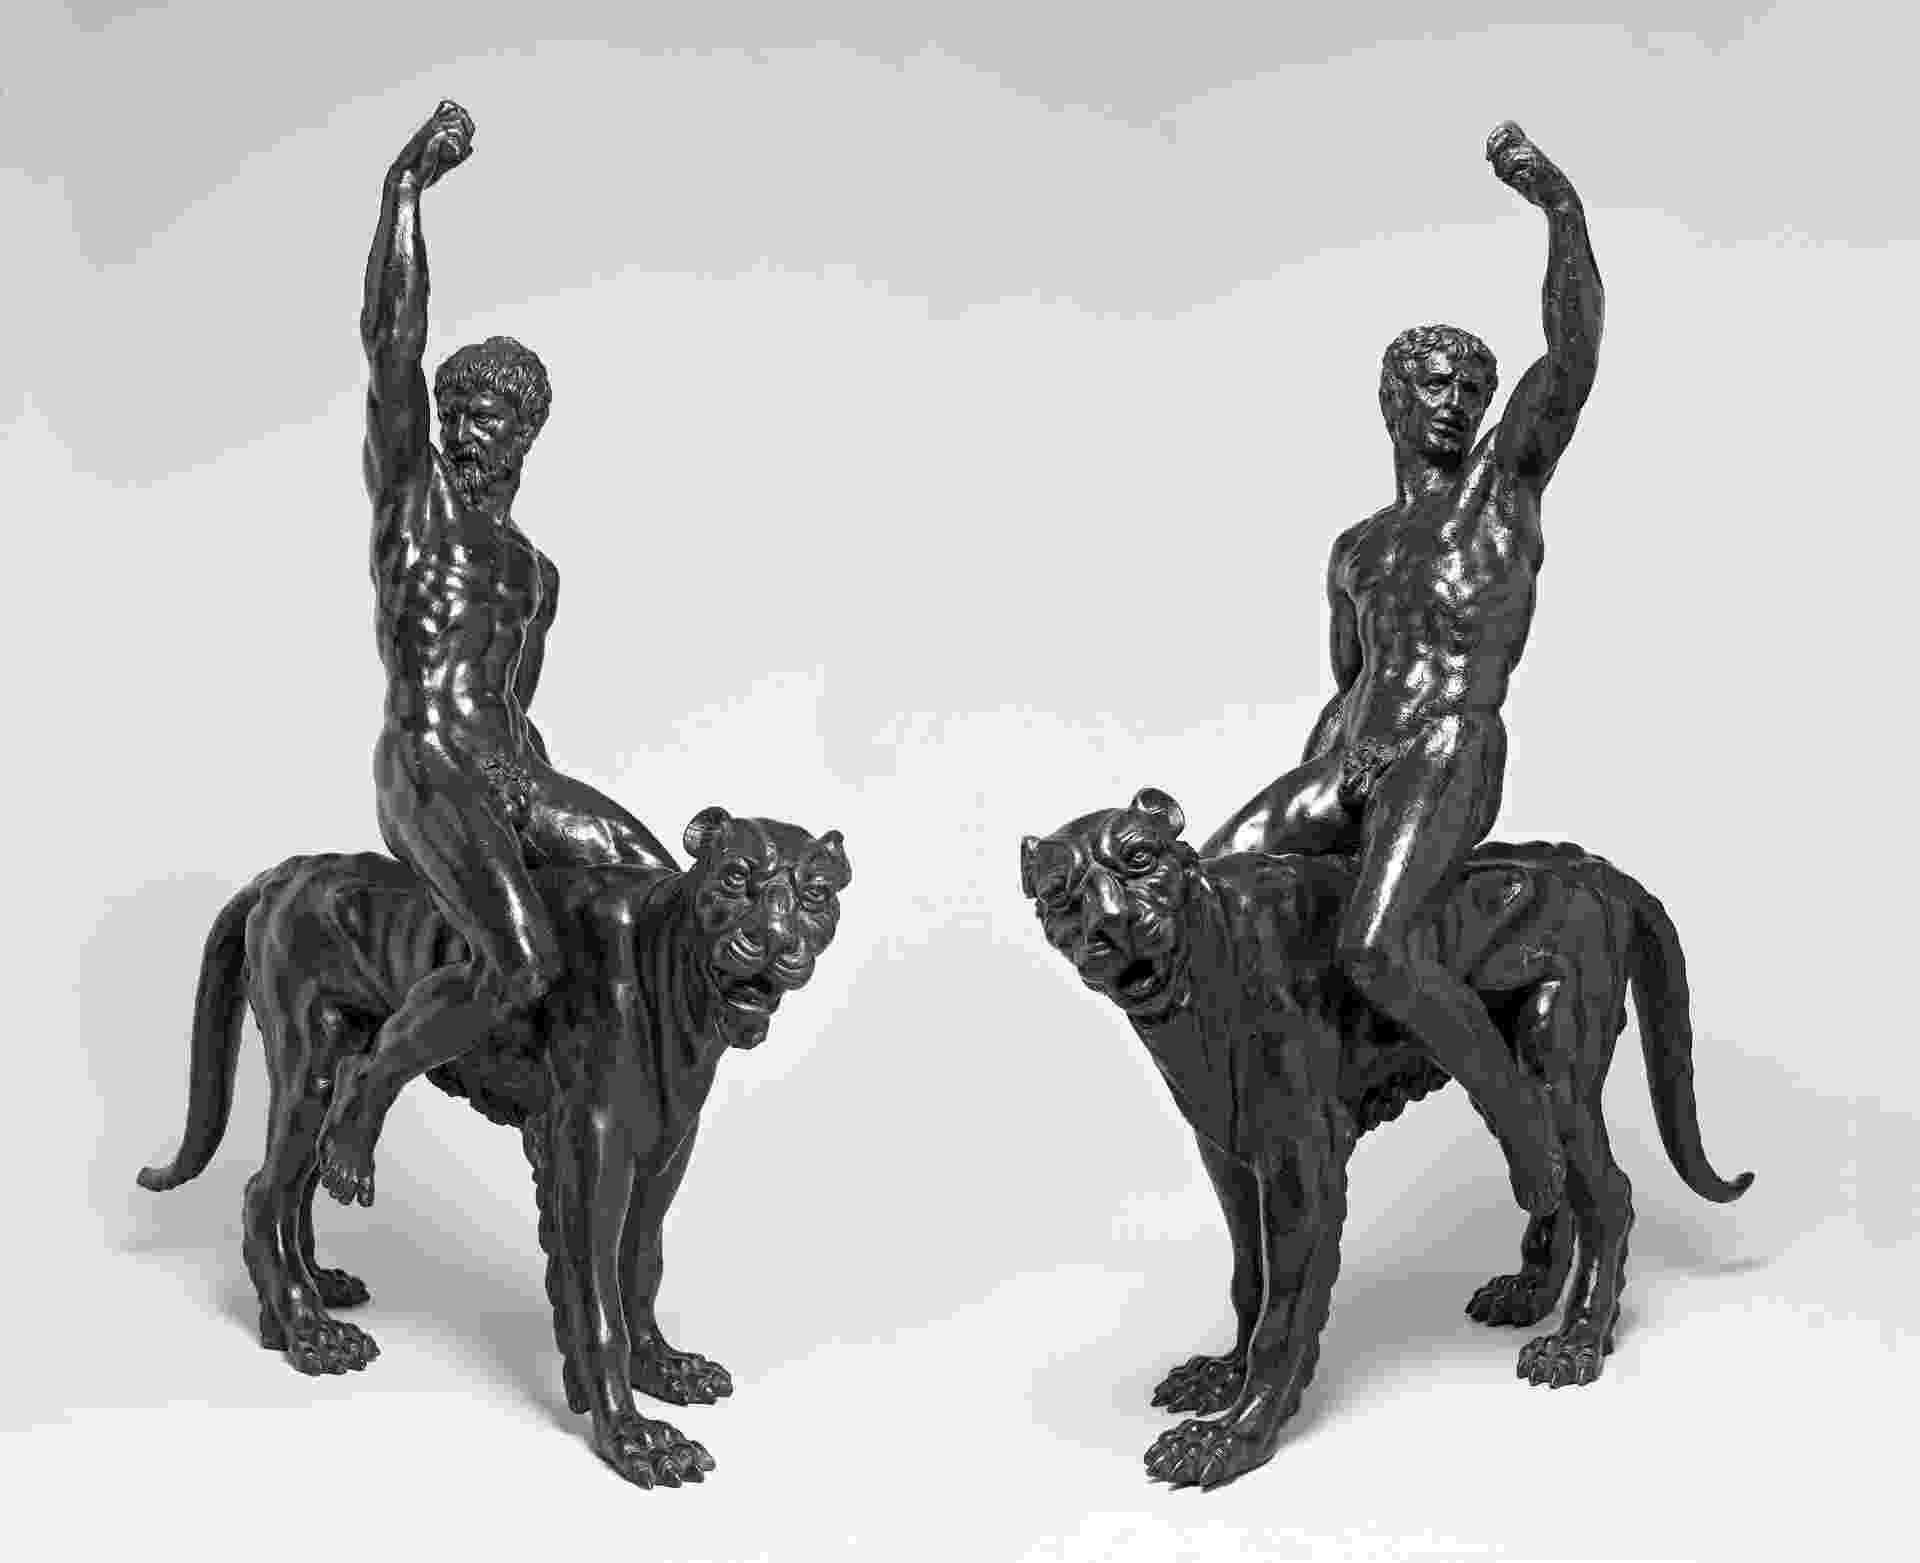 Duas esculturas de bronze escuro expostas em Cambridge, na Inglaterra, podem ser de Michelangelo - Fitzwilliam Museum/Cambridge